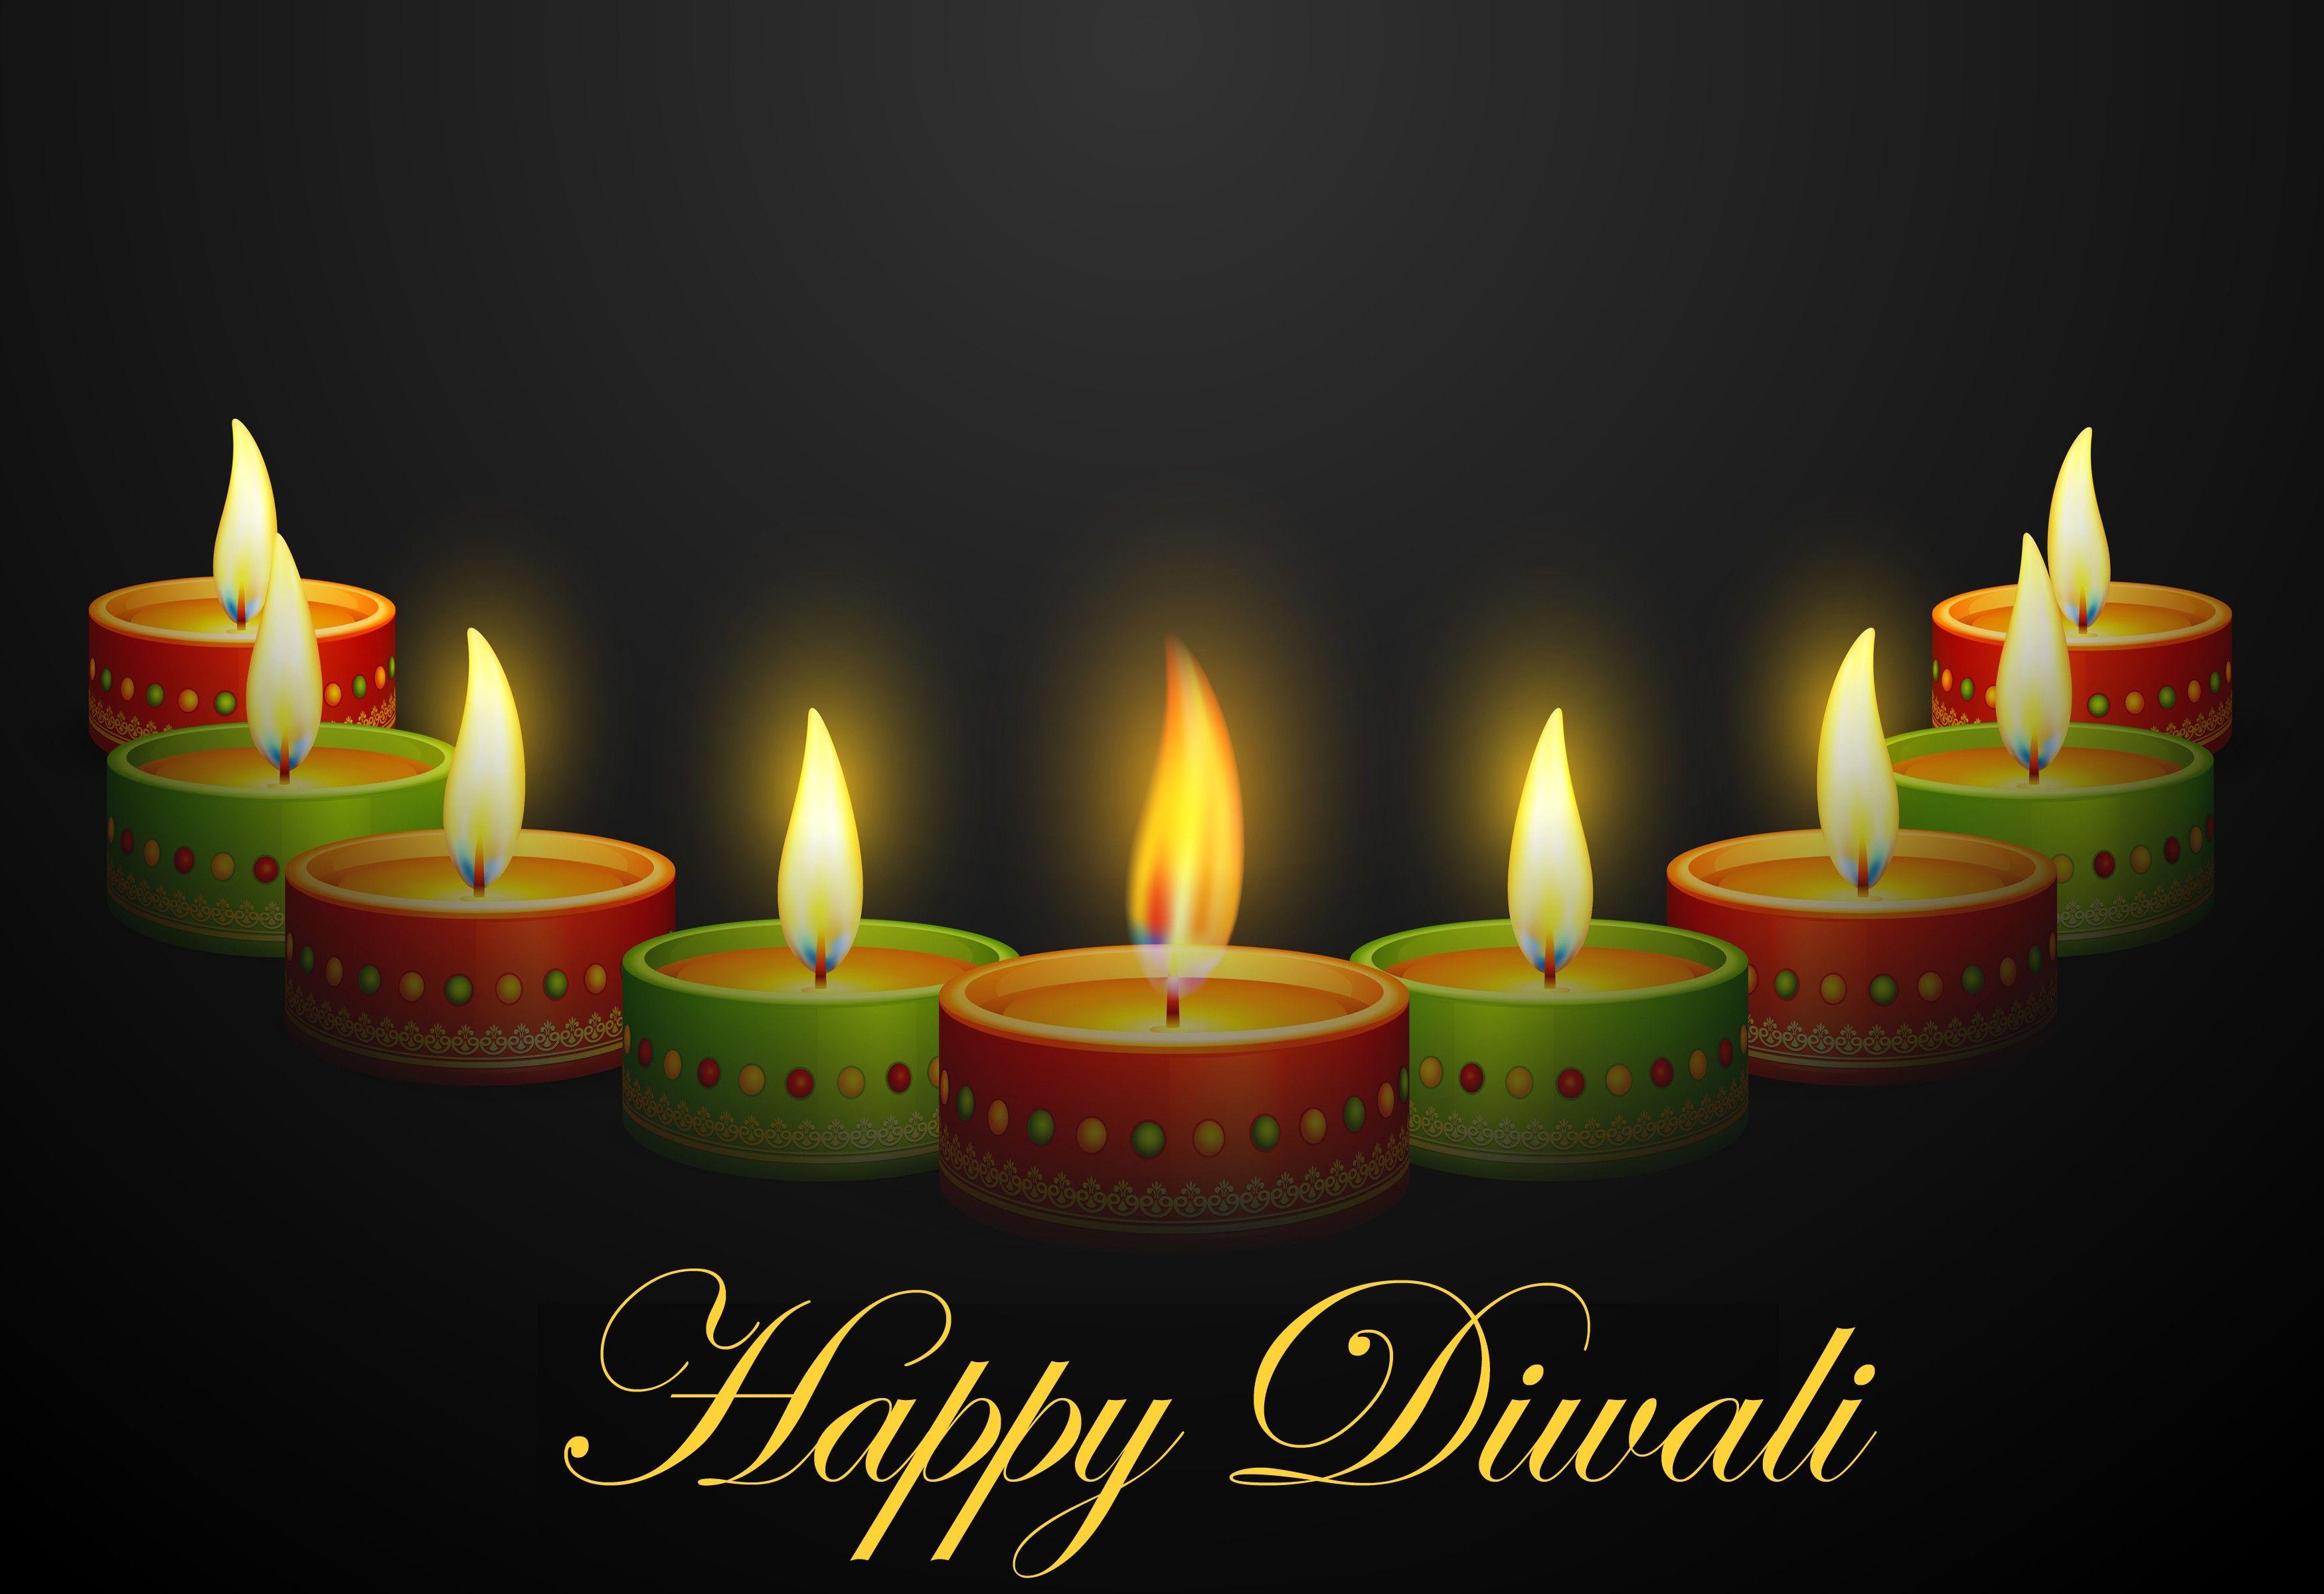 happy diwali hd wallpapers - photo #41